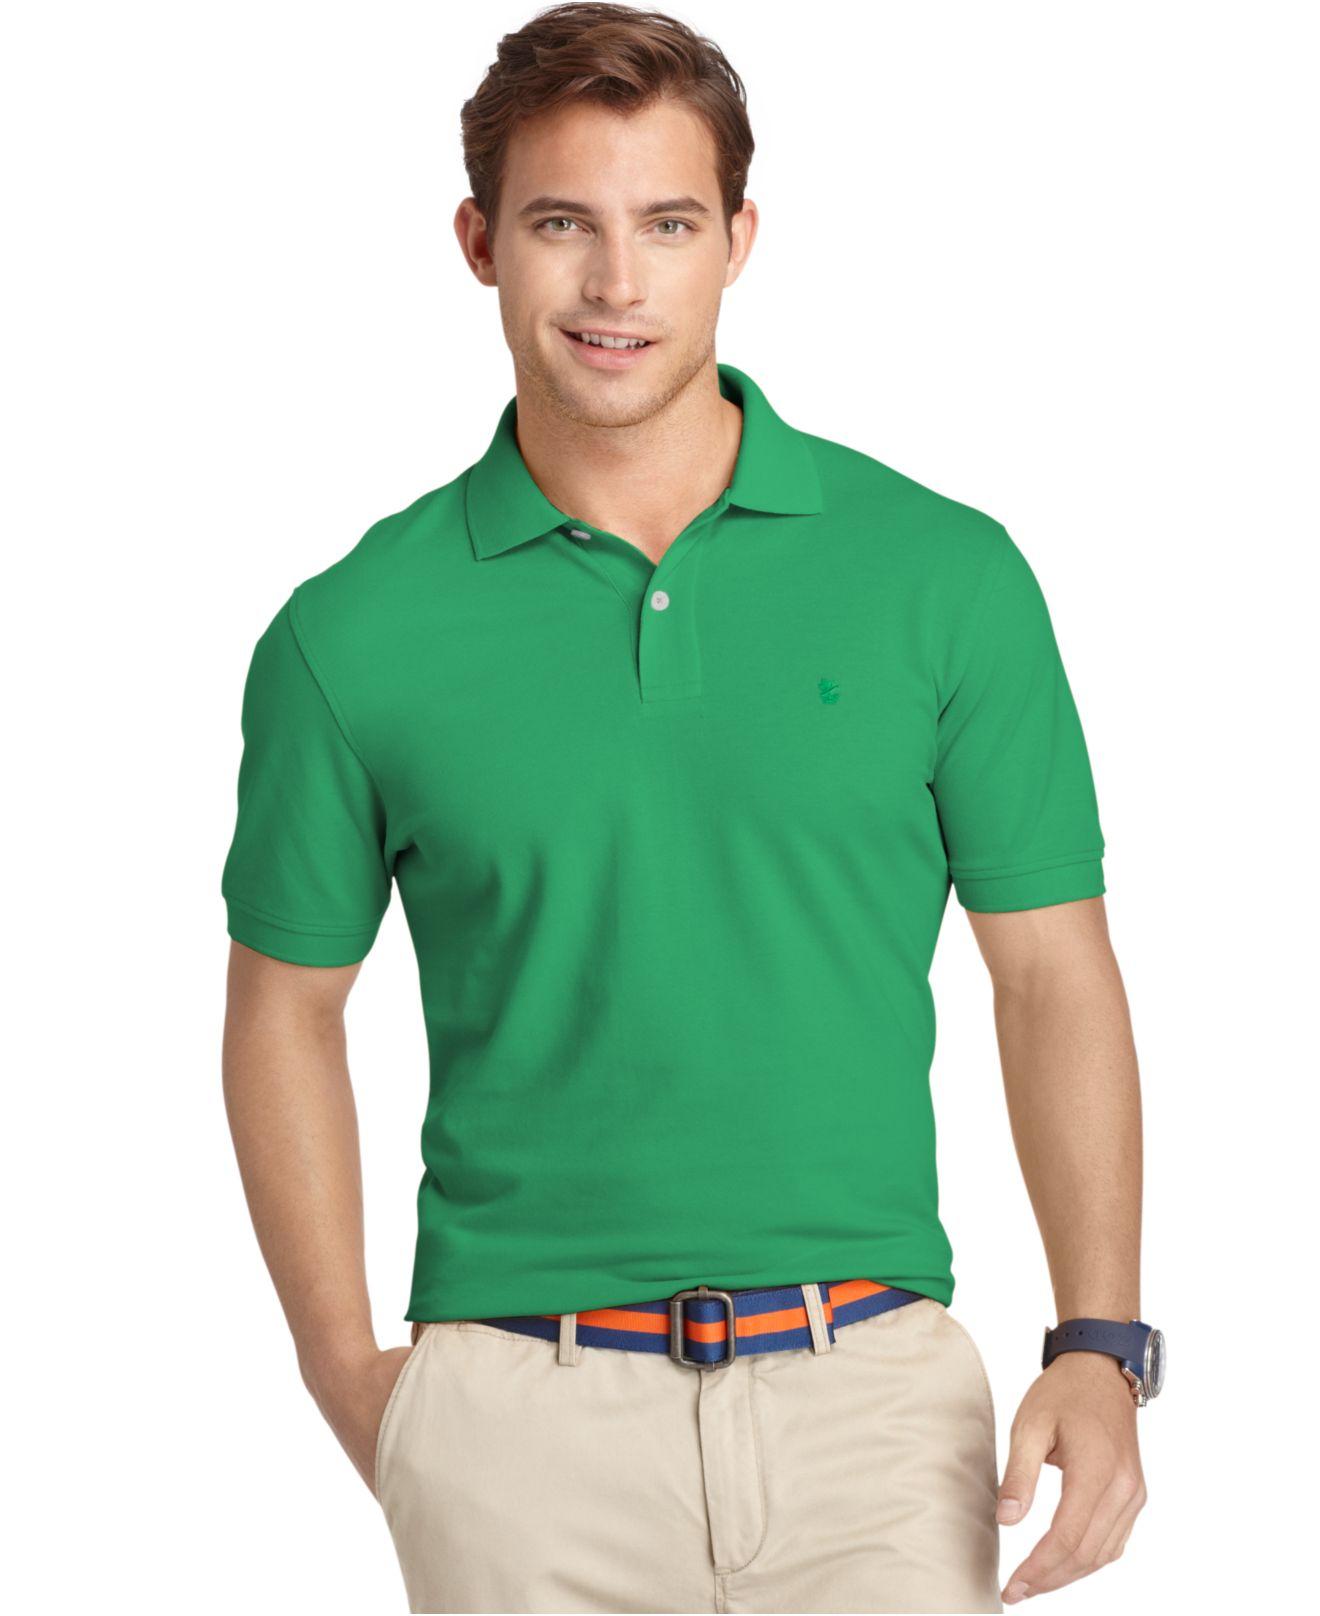 Izod Polo Shirts Amazon Bcd Tofu House